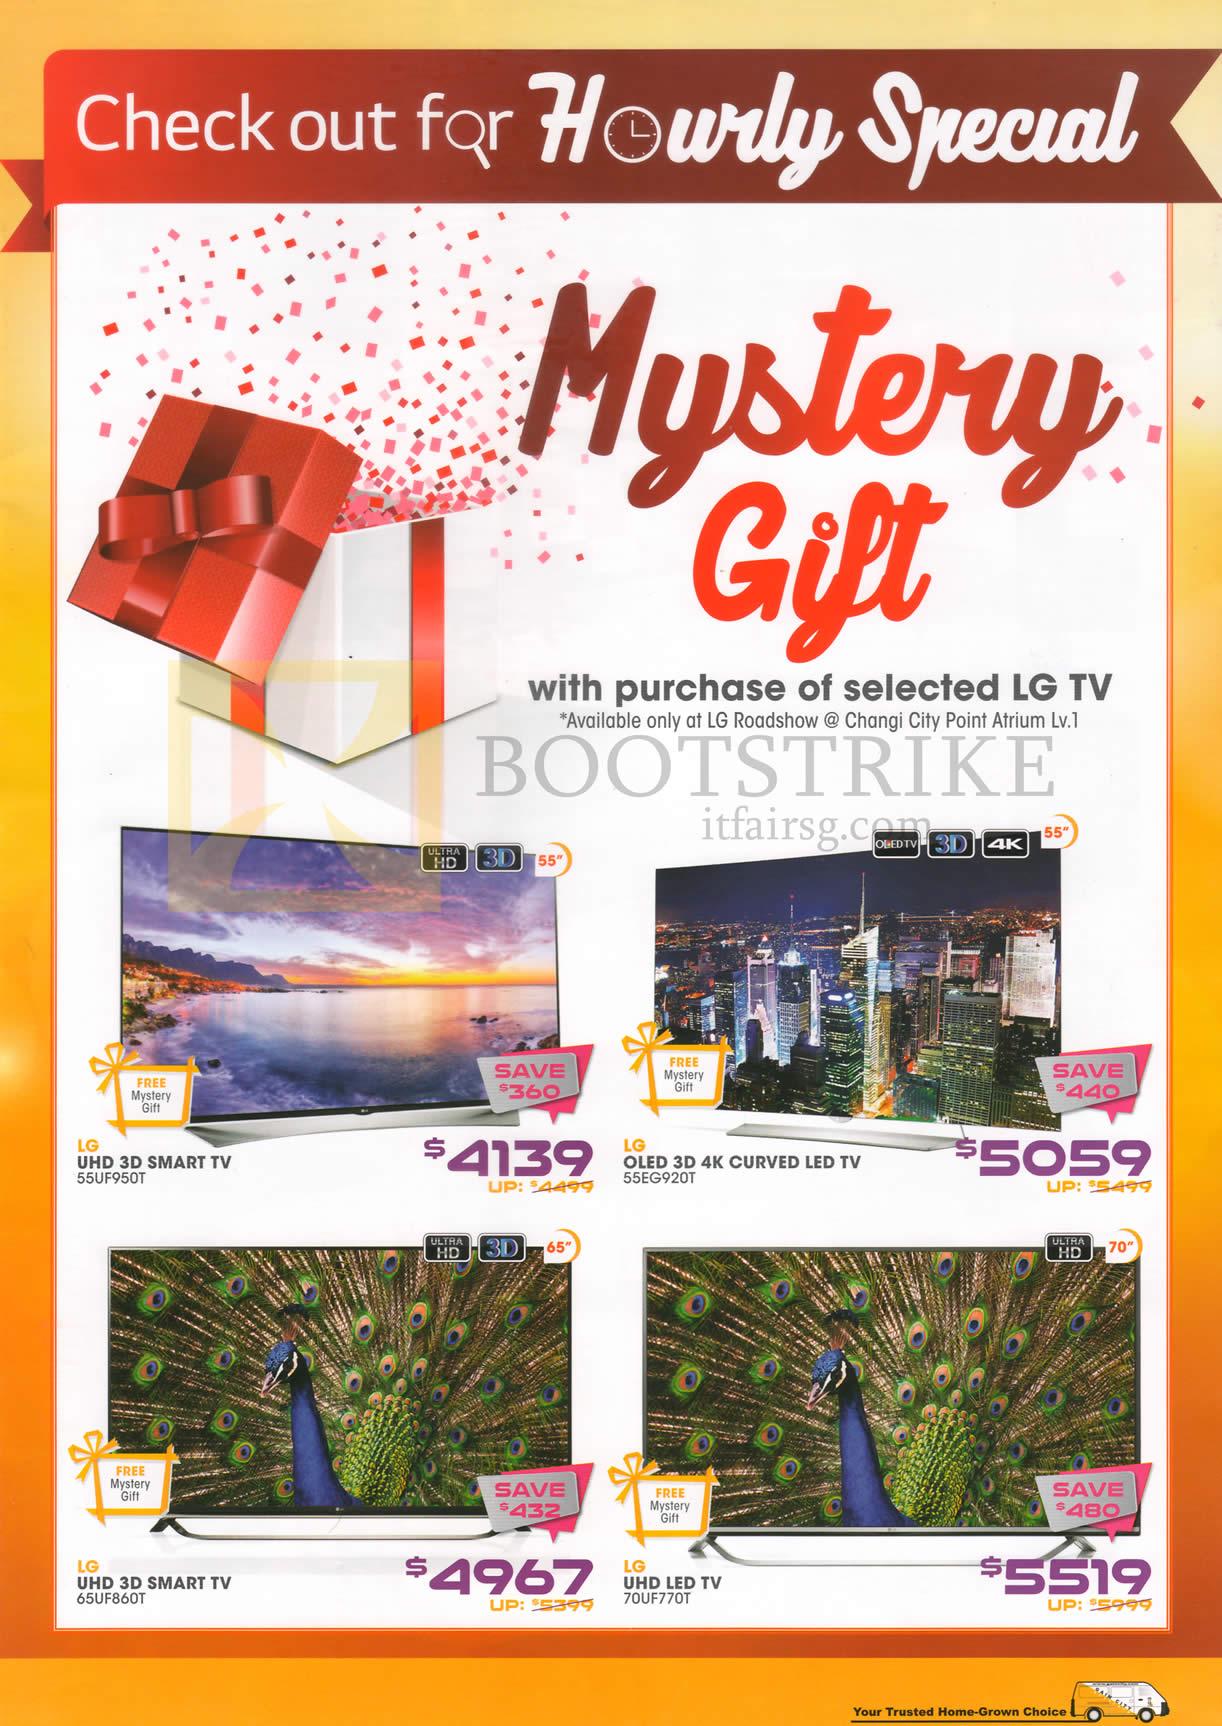 SITEX 2015 price list image brochure of Gain City TVs LG 55UF950T, LG55EG920T, LG65UF860T, LG70UF770T